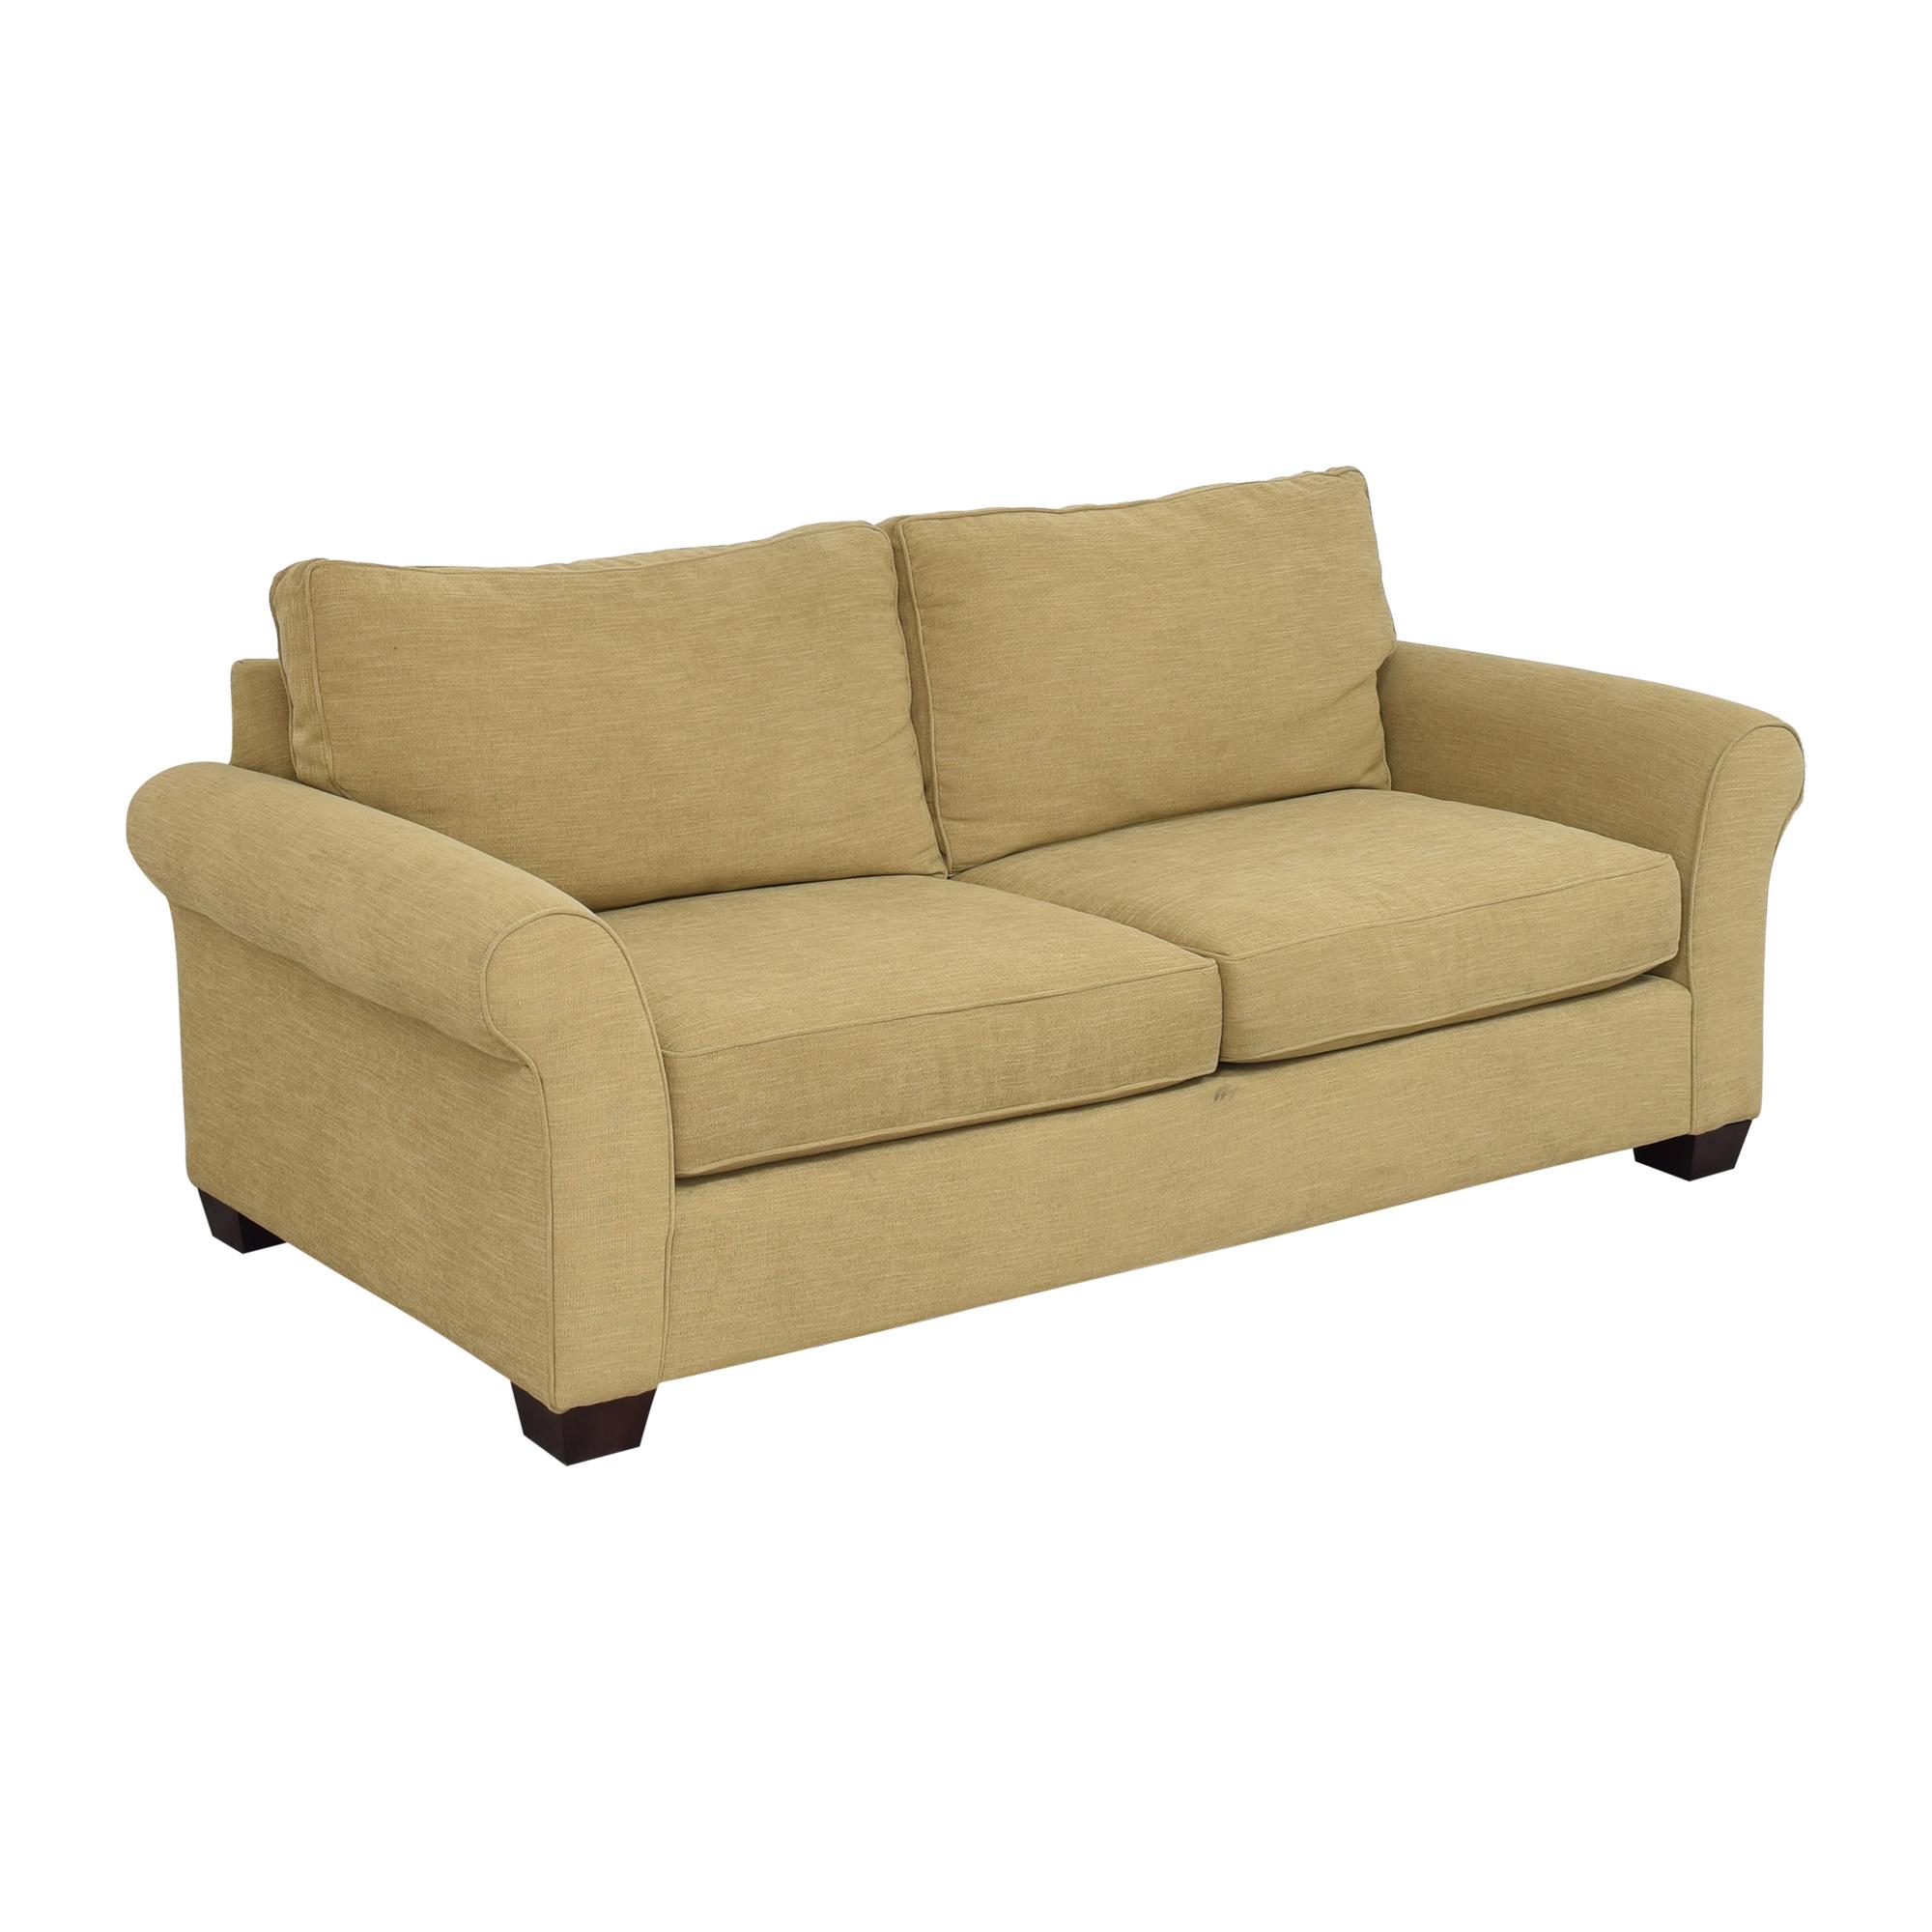 Pottery Barn Pottery Barn Comfort Roll Arm Sofa on sale